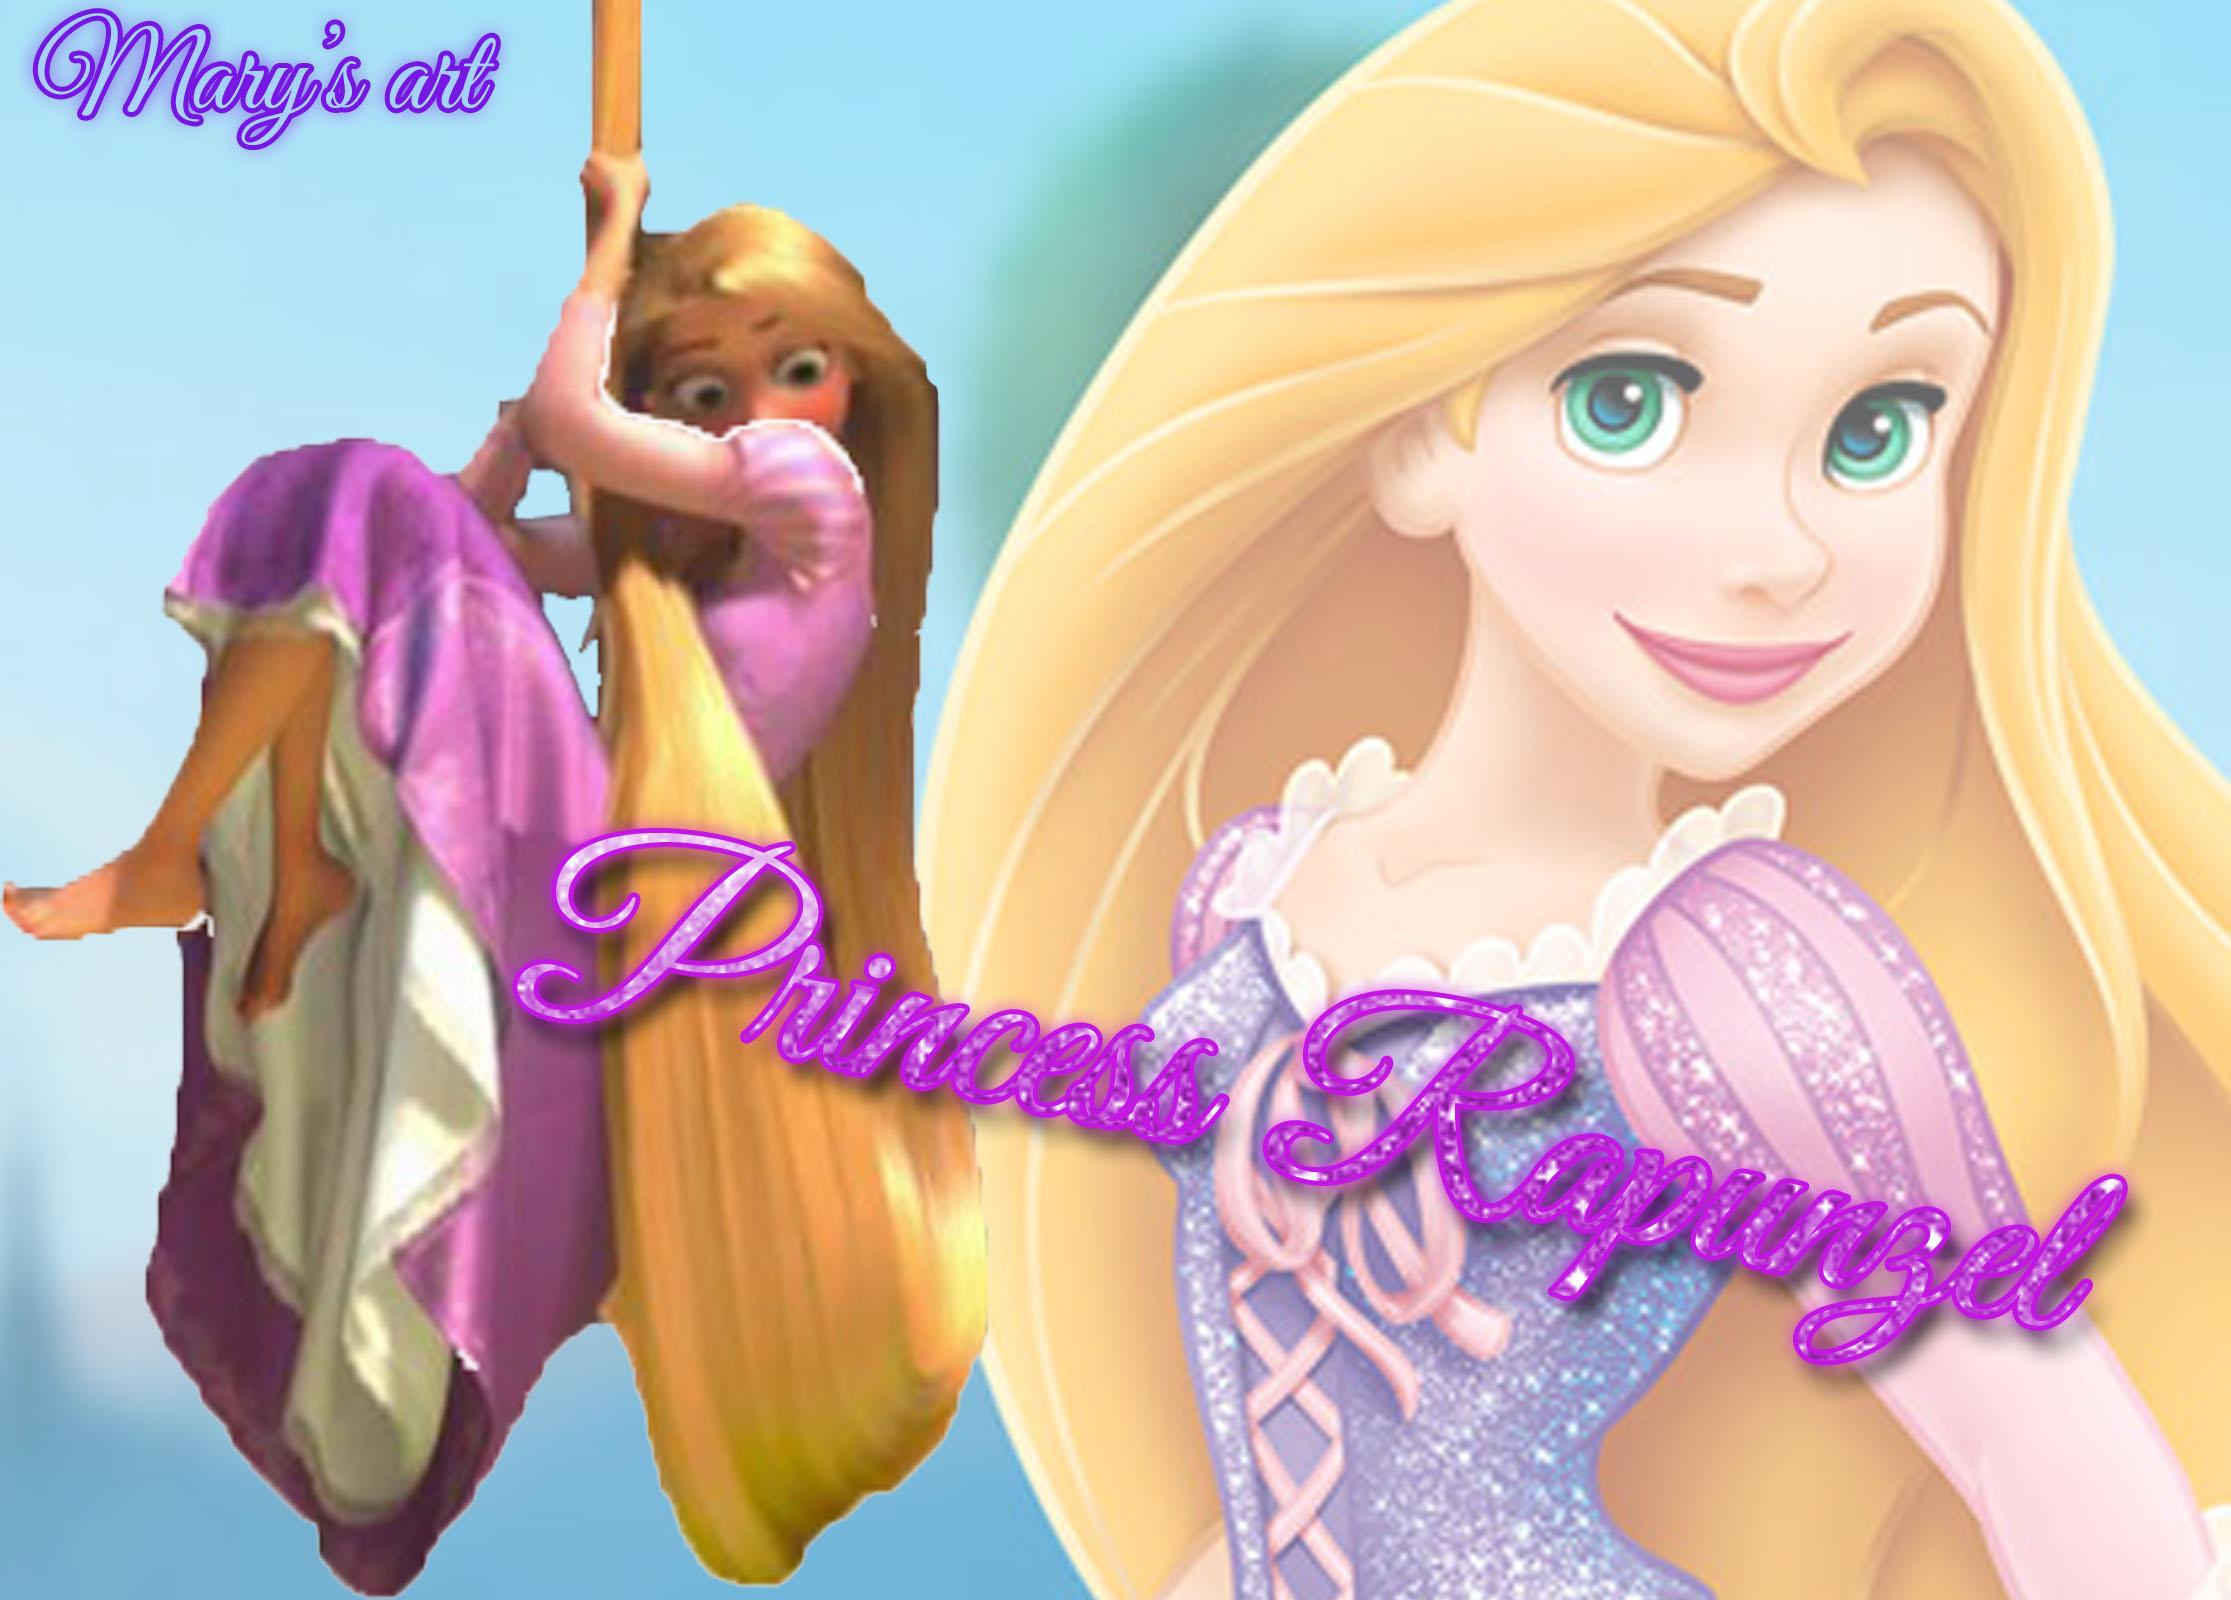 Disney Princess Rapunzel Wallpaper